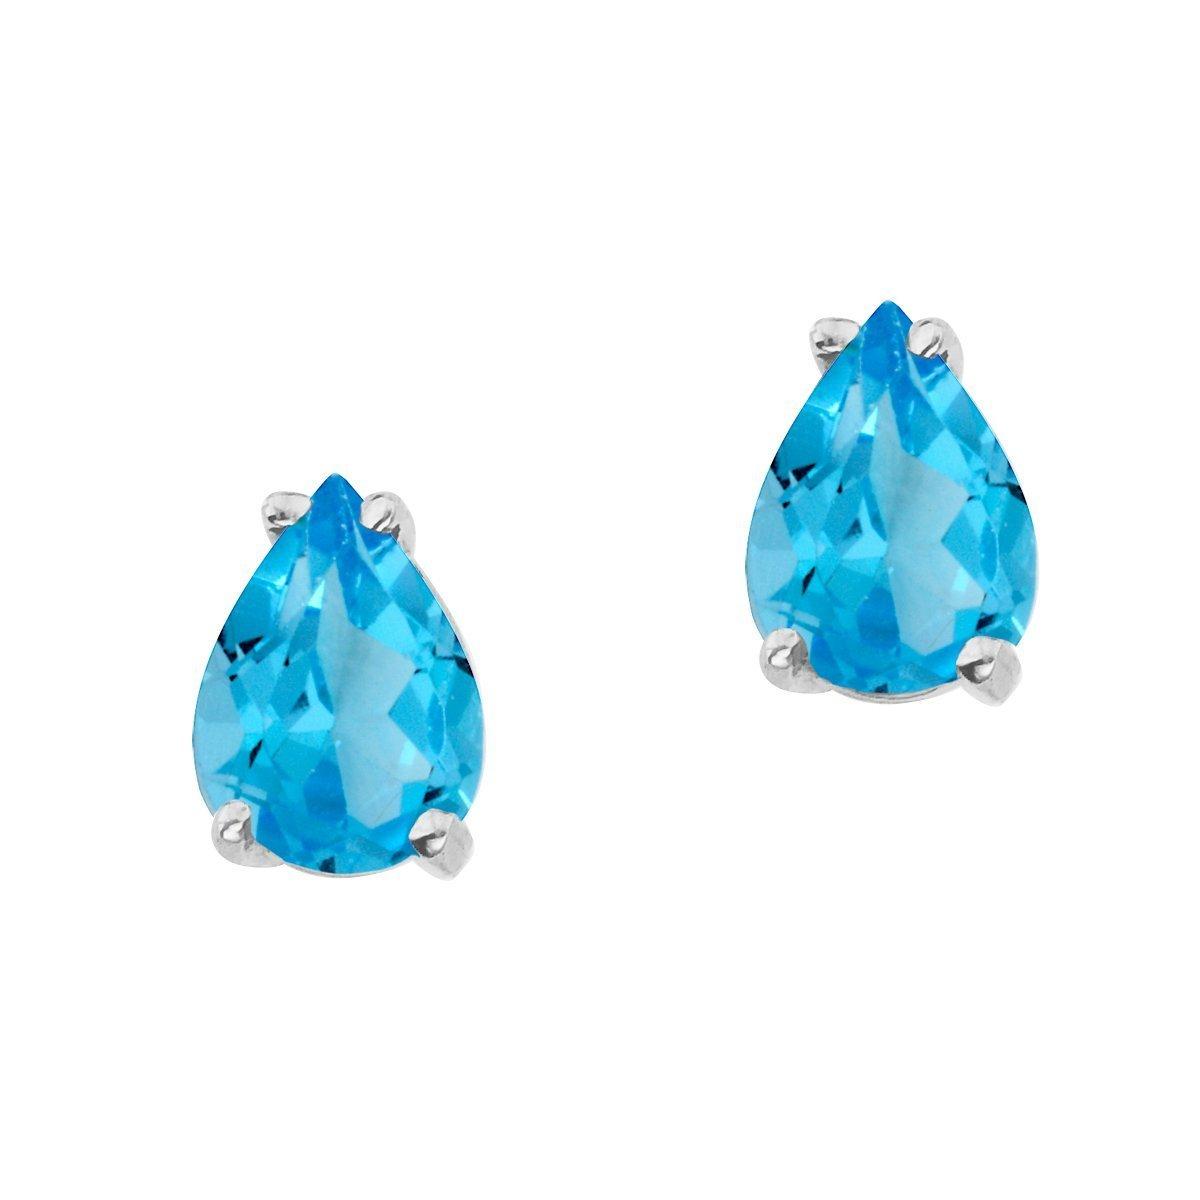 FB Jewels Solid 14k White Gold Studs Pear Gemstone Shaped Earrings